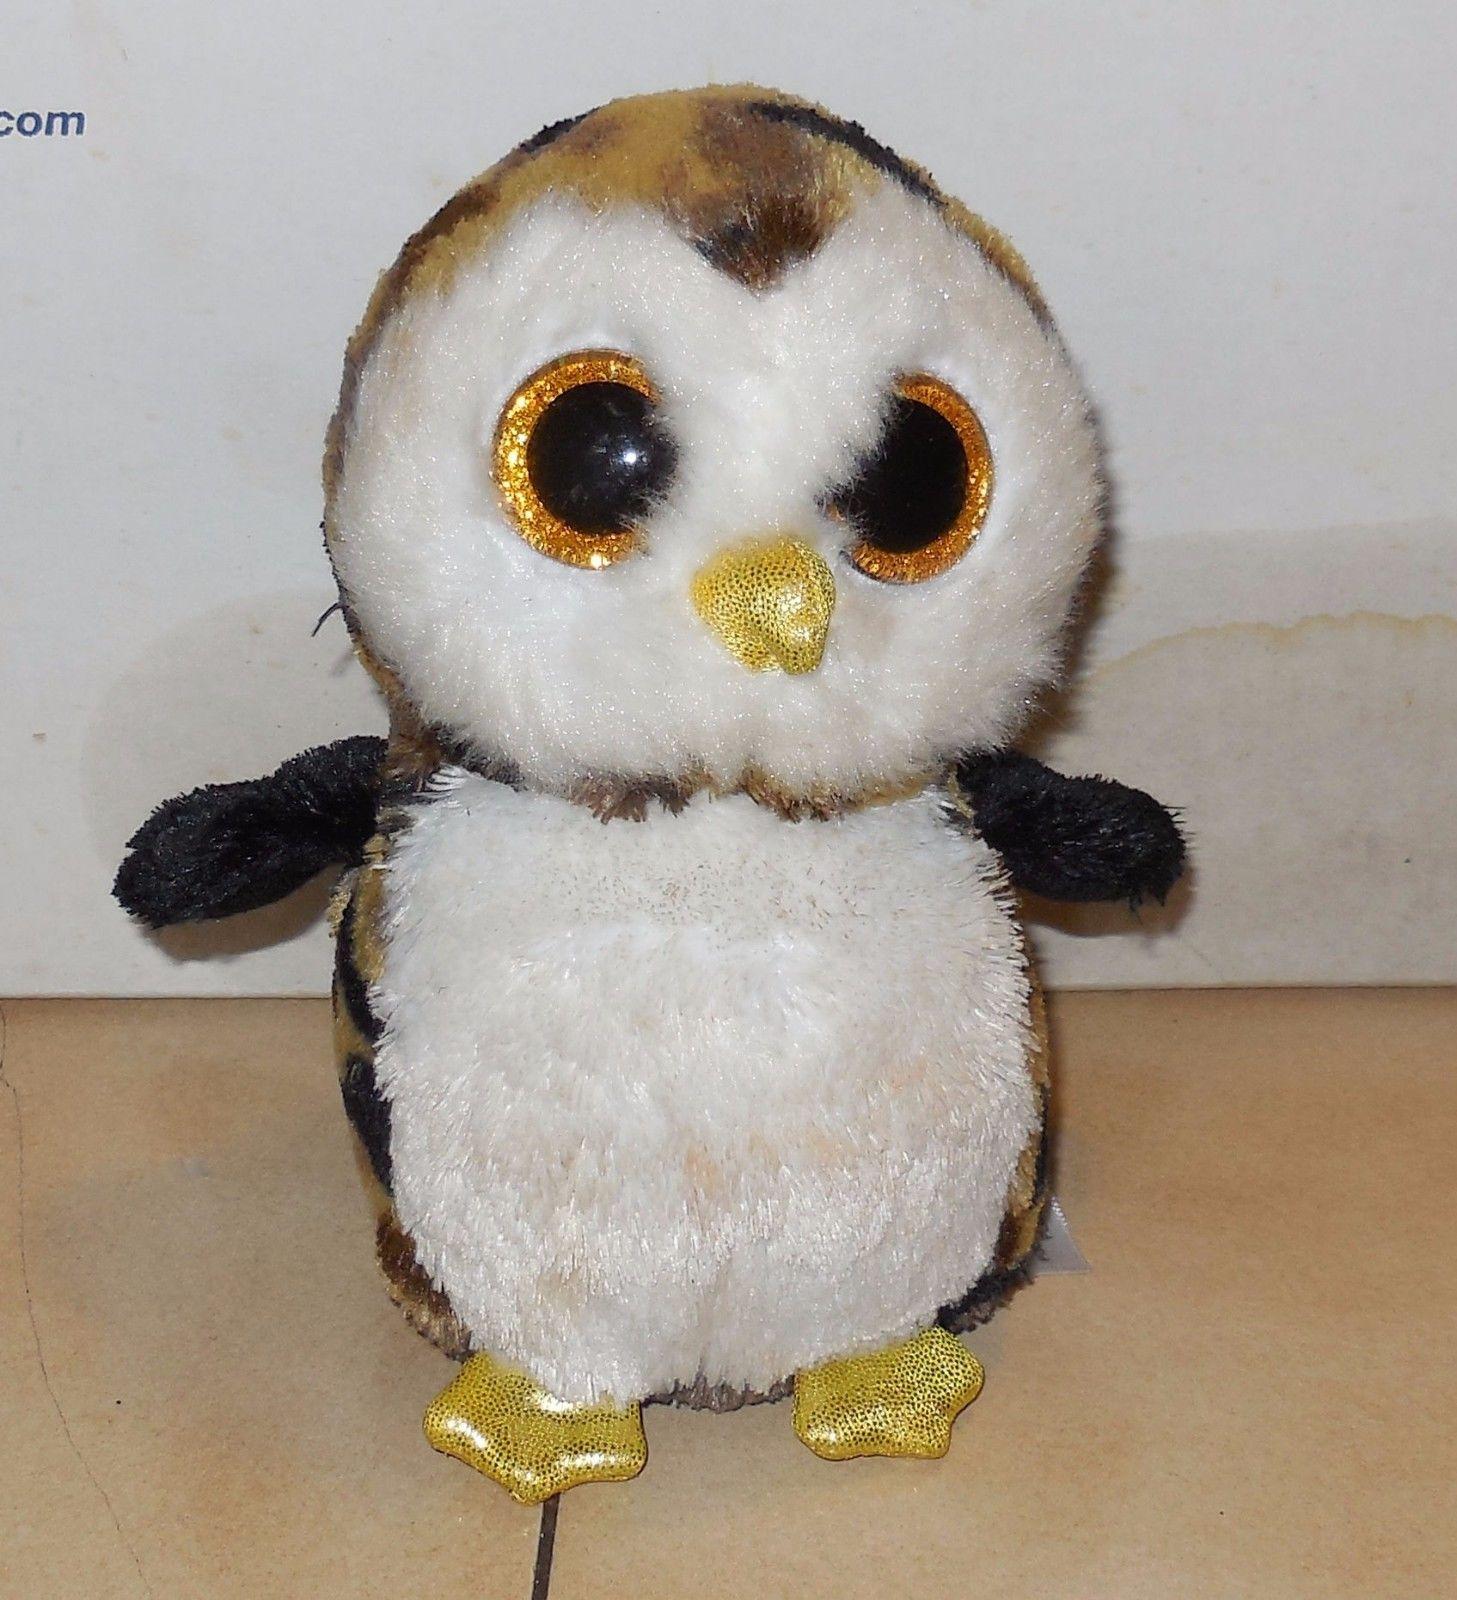 c40b8abdce1 TY Owler the Owl Beanie Baby Bird plush toy and similar items